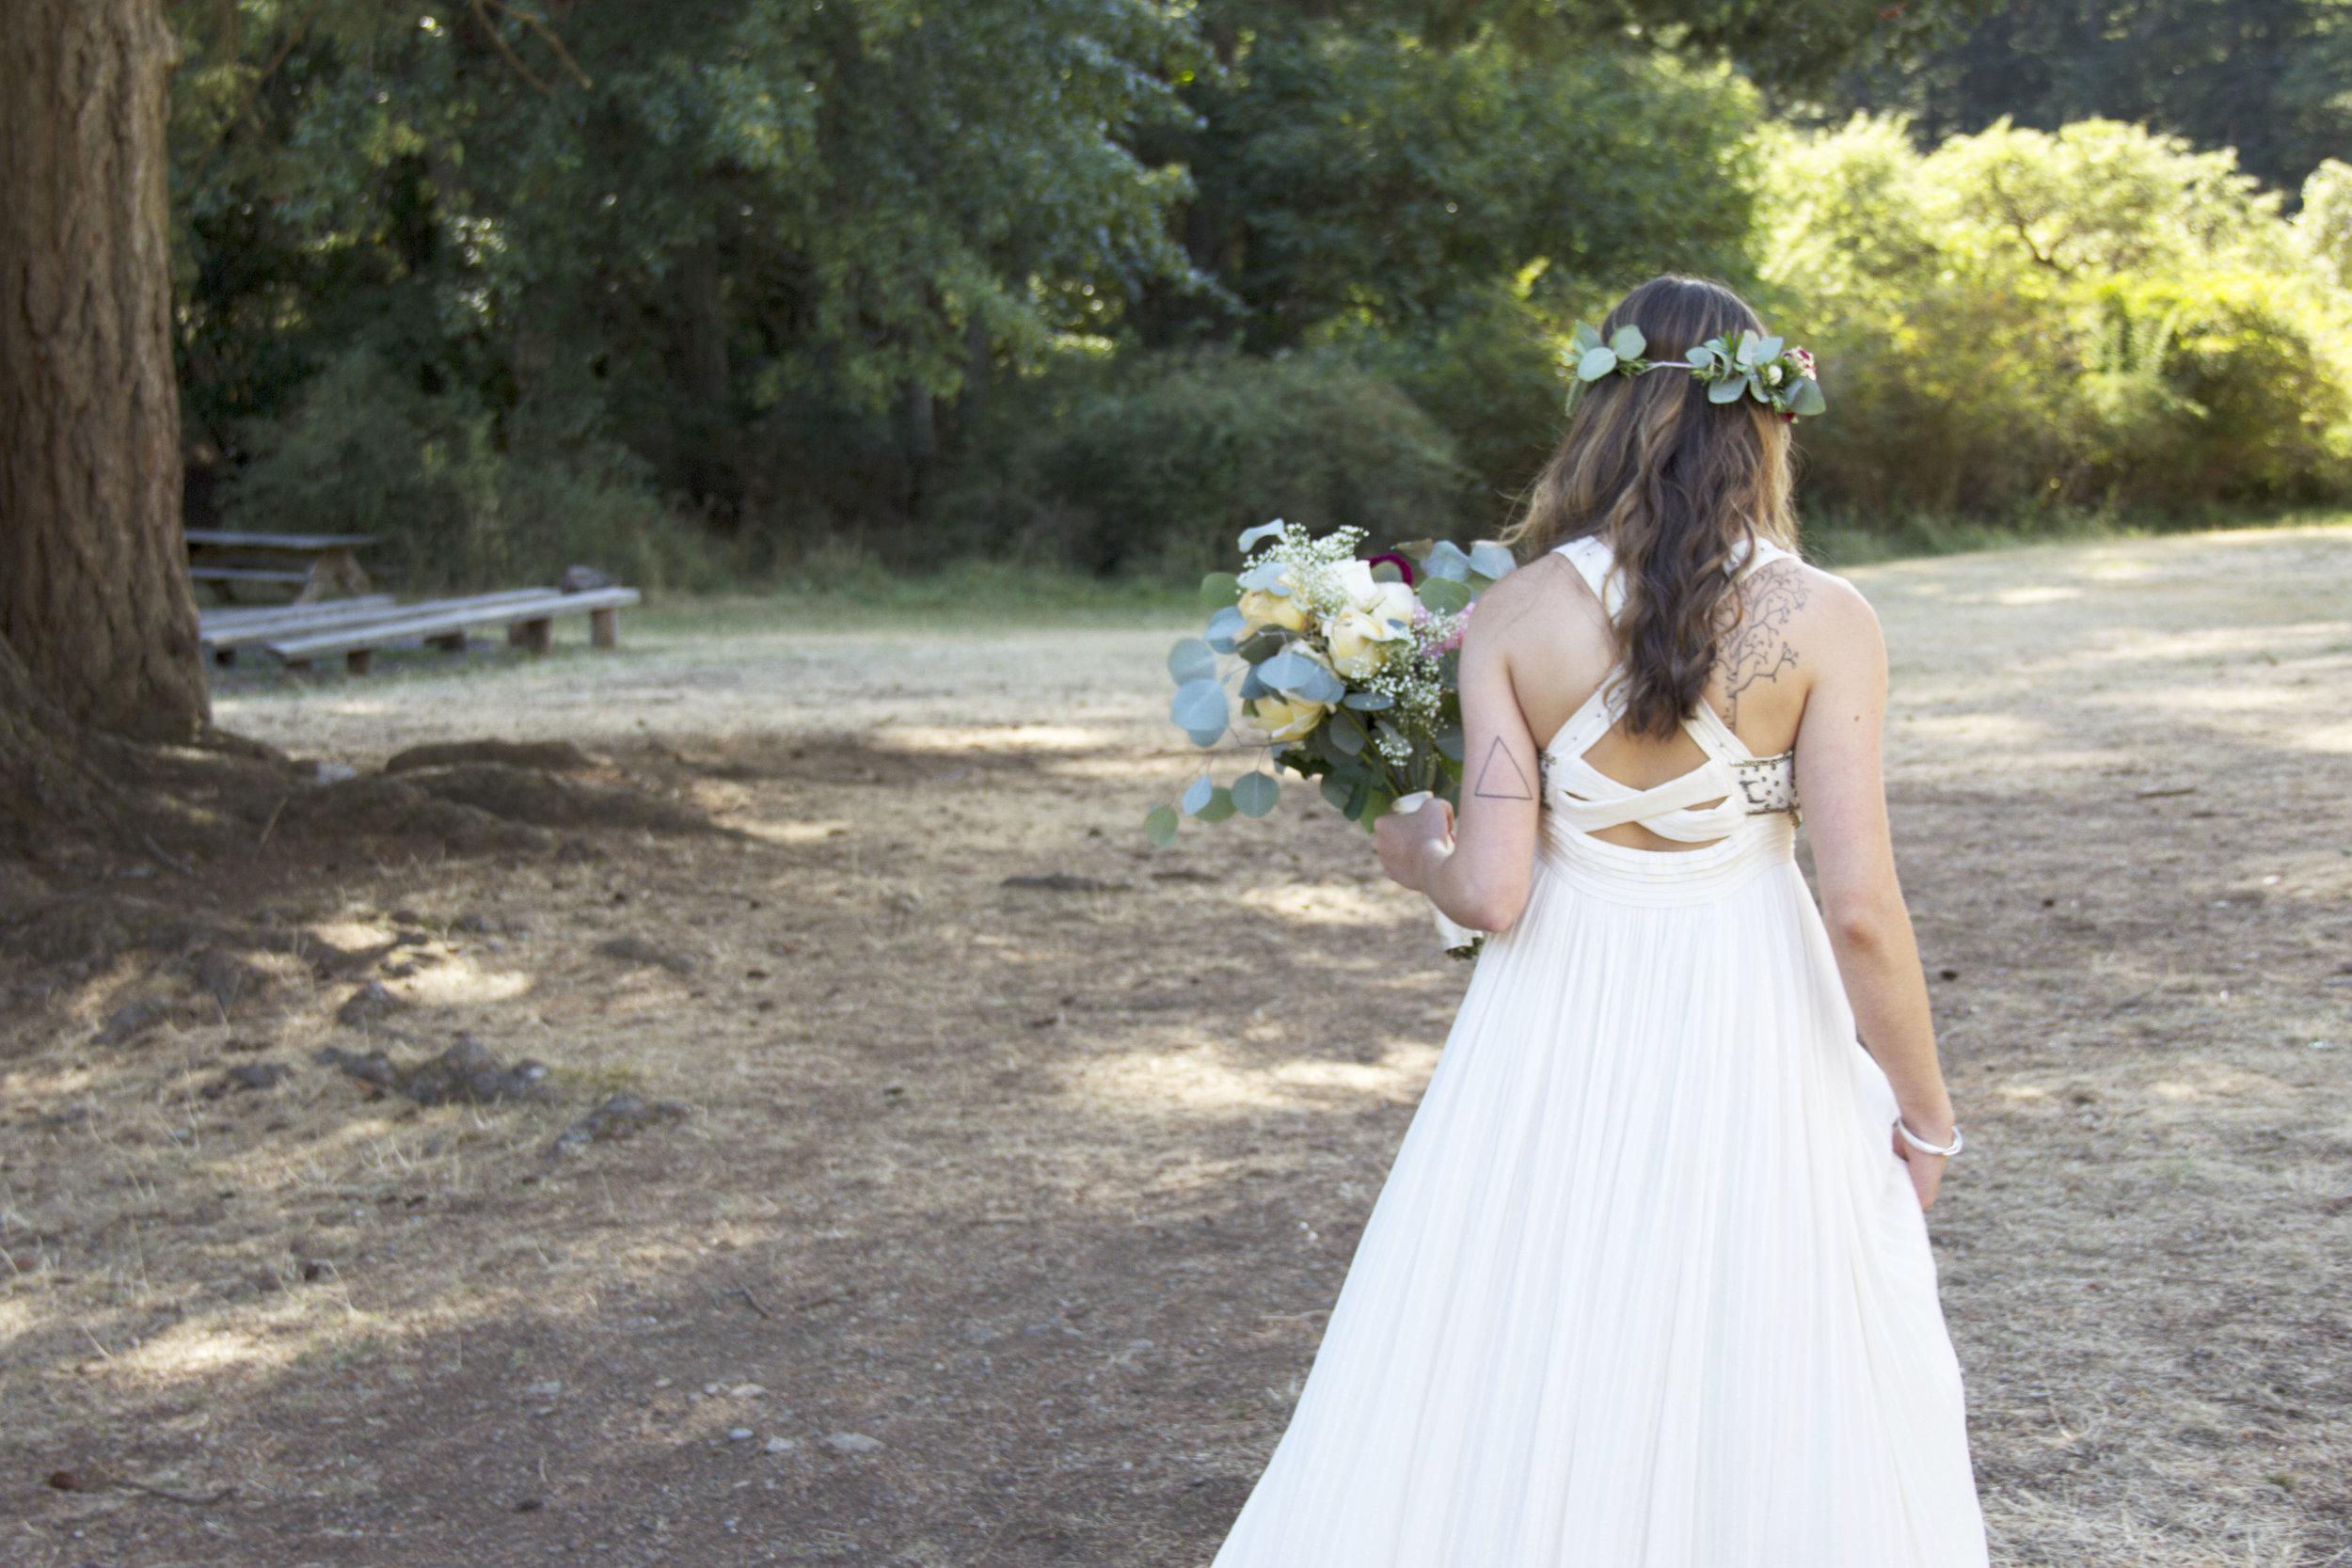 Aubree wedding 1.jpg